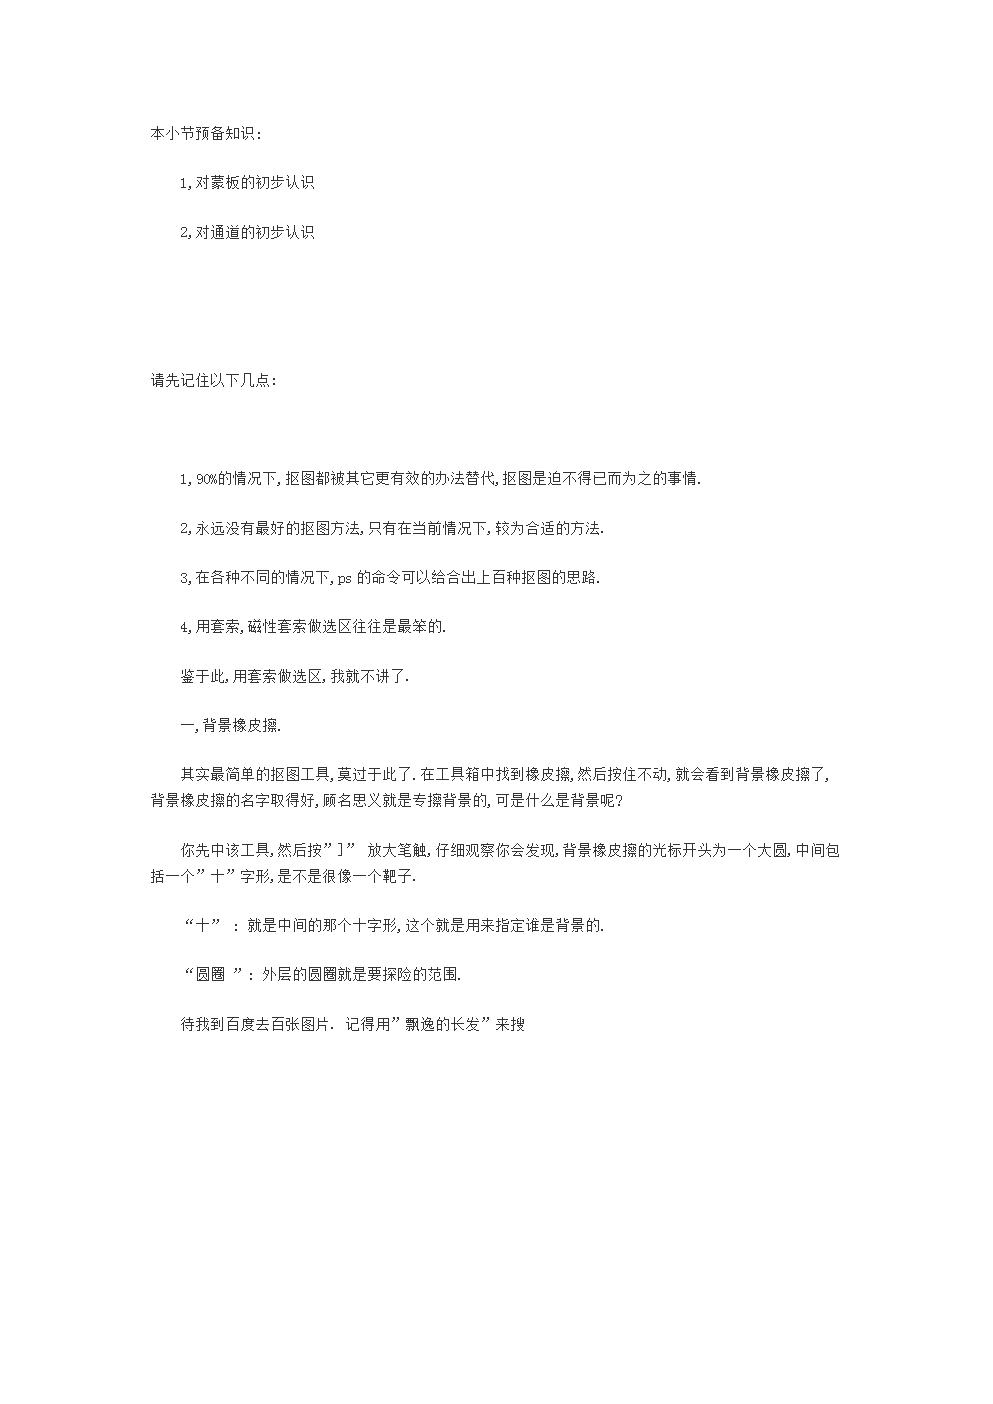 PS蒙版通道为飘逸长发美女抠图的教程.docx